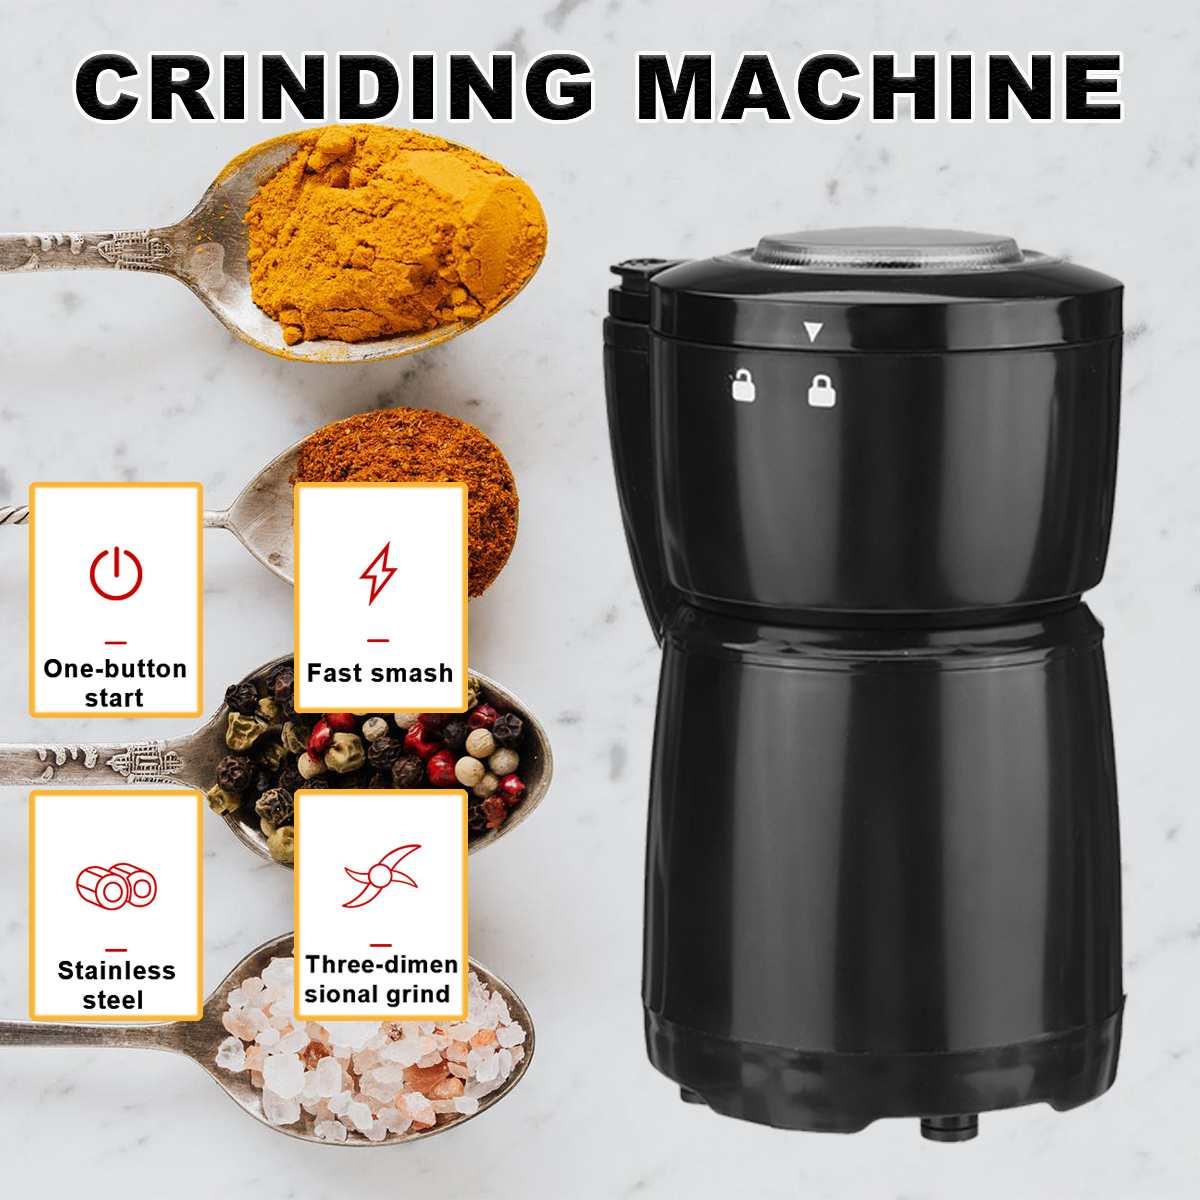 2021New مطحنة بن كهربائية المطبخ الكهربائية الحبوب الجوز الفول مطحنة التوابل متعددة الوظائف المنزلية مطحنة القهوة